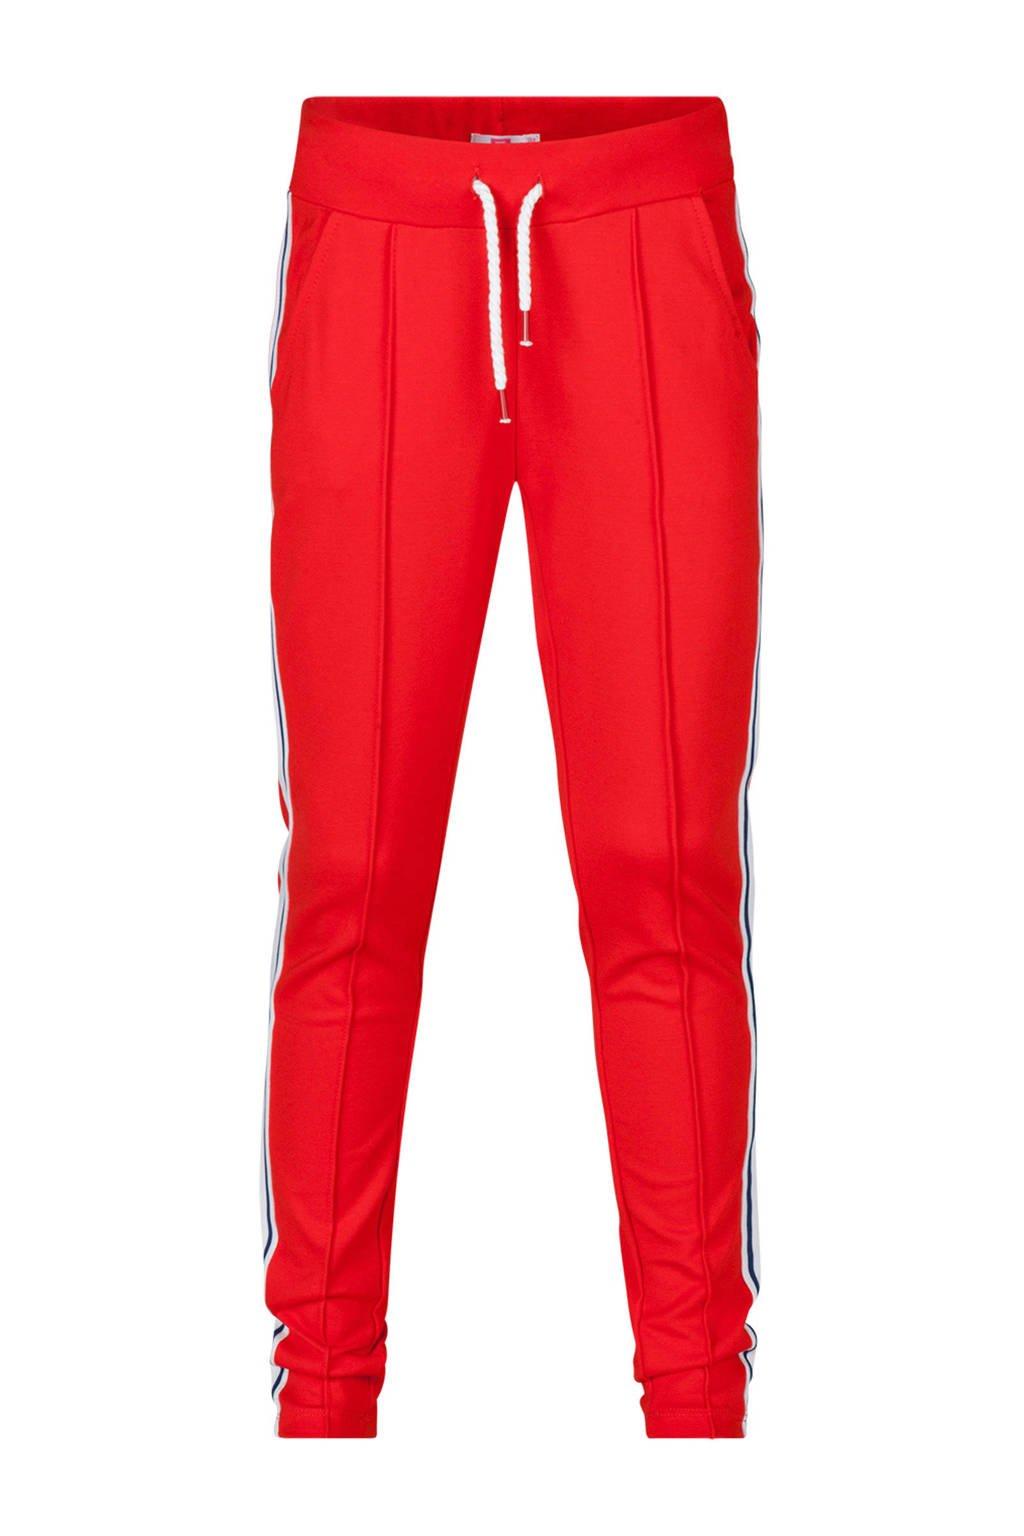 WE Fashion sweatpants met zijstreep rood, Rood/wit